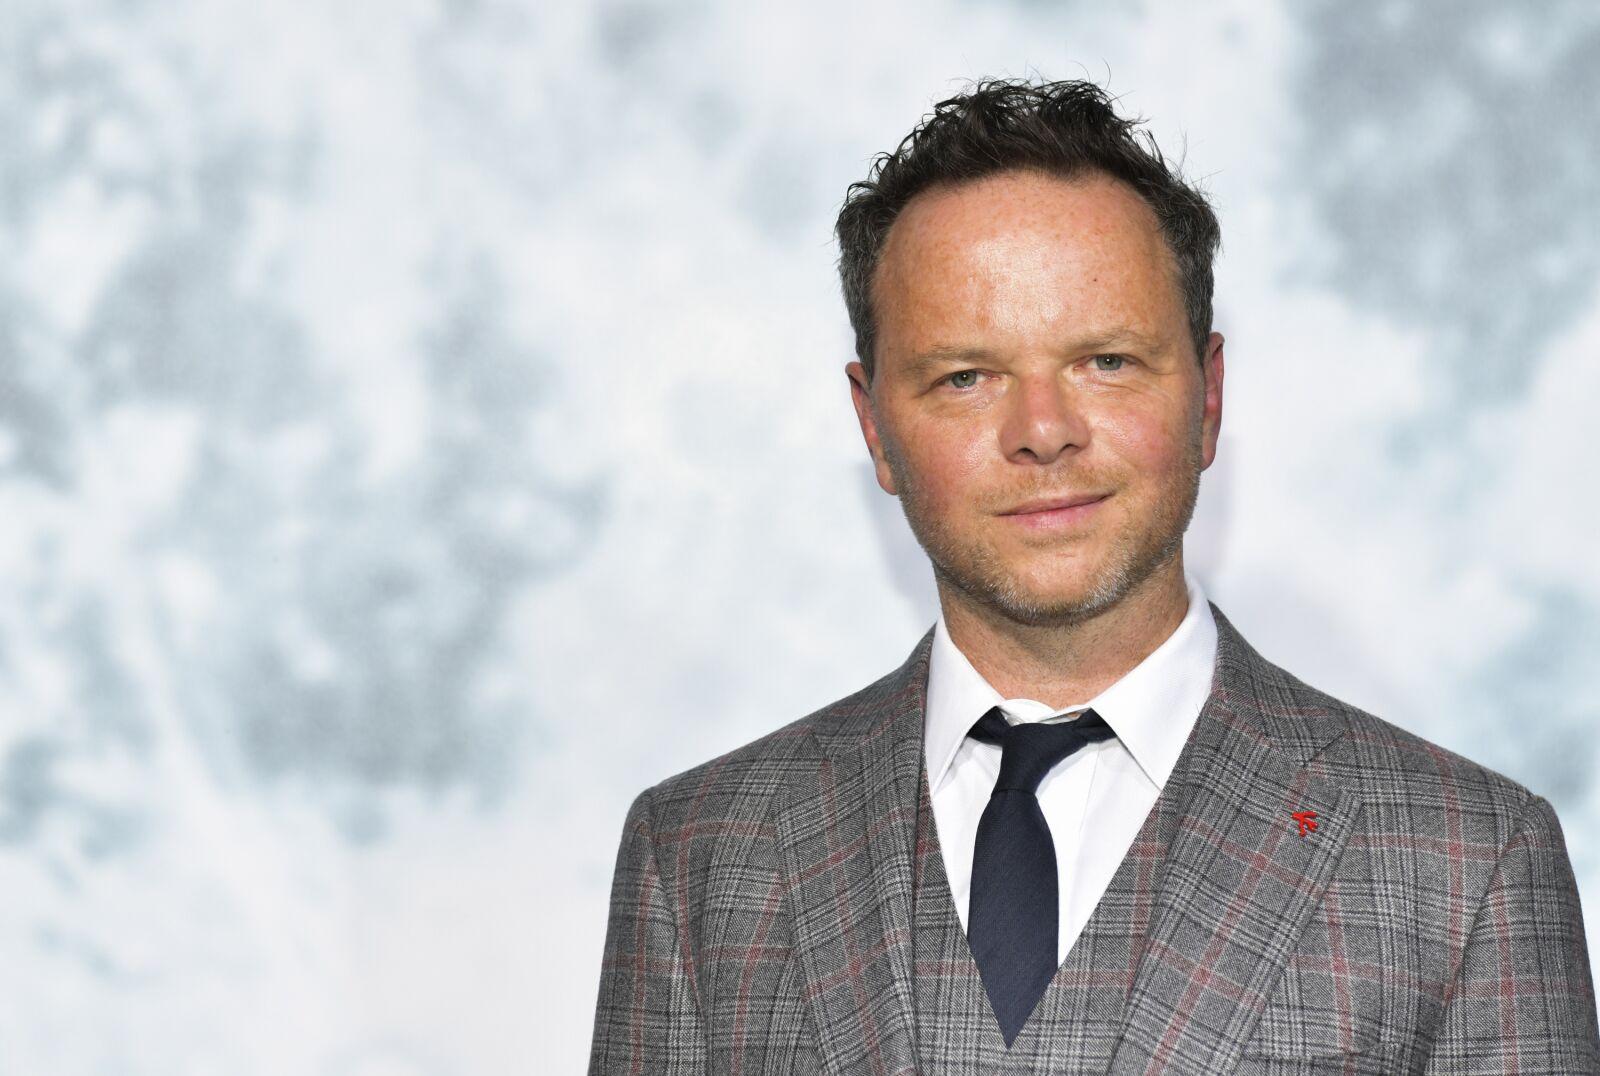 Noah Hawley to write and direct Star Trek 4, Chris Pine to return as Kirk